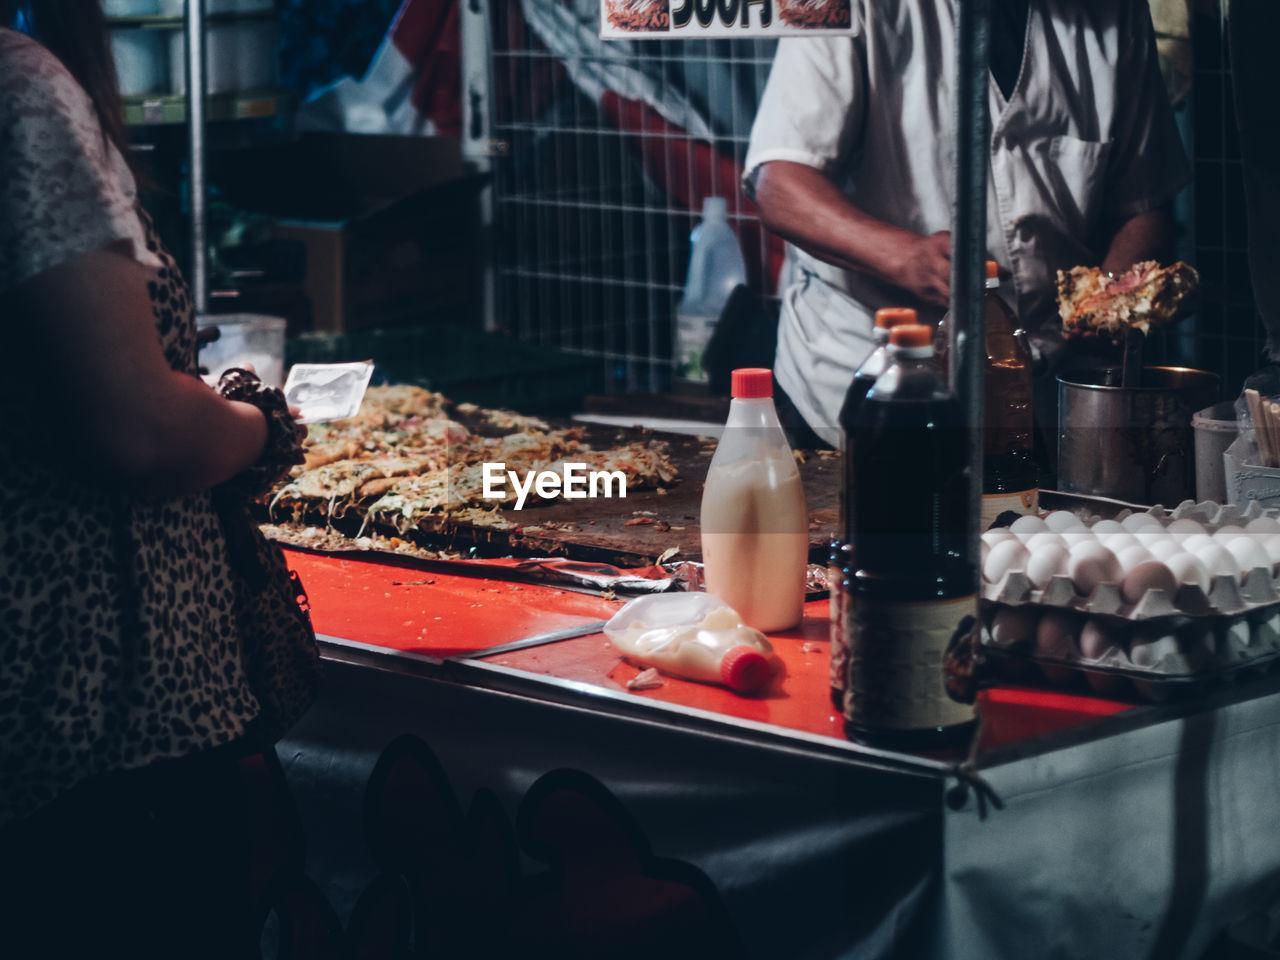 Food stall at summer festival matsuri at night in japan / small business